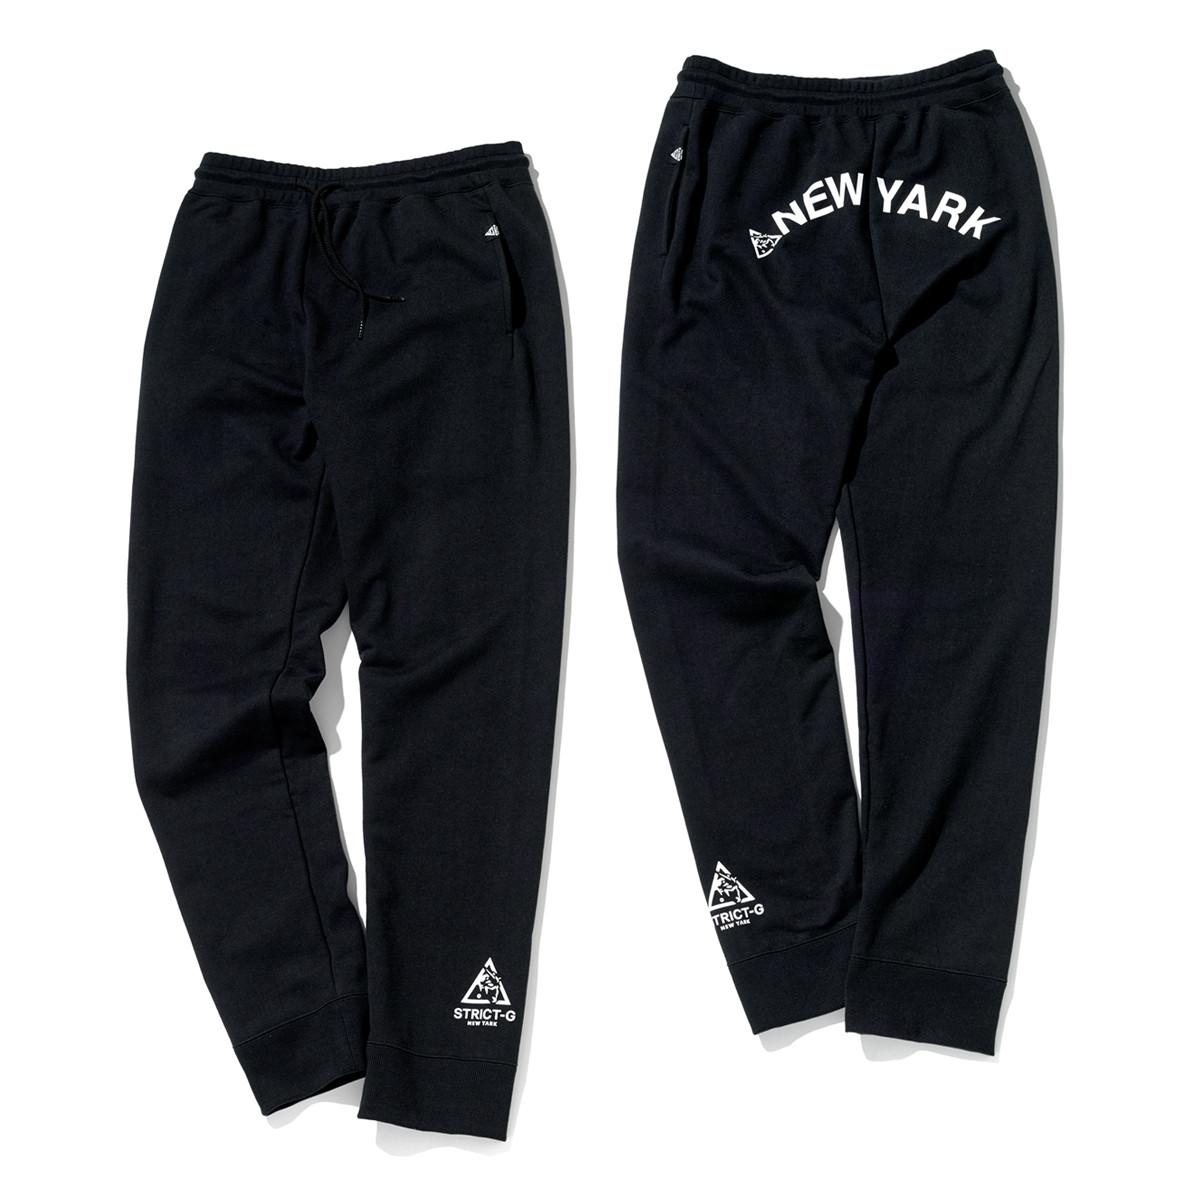 STRICT-G NEW YARK Sweatpants